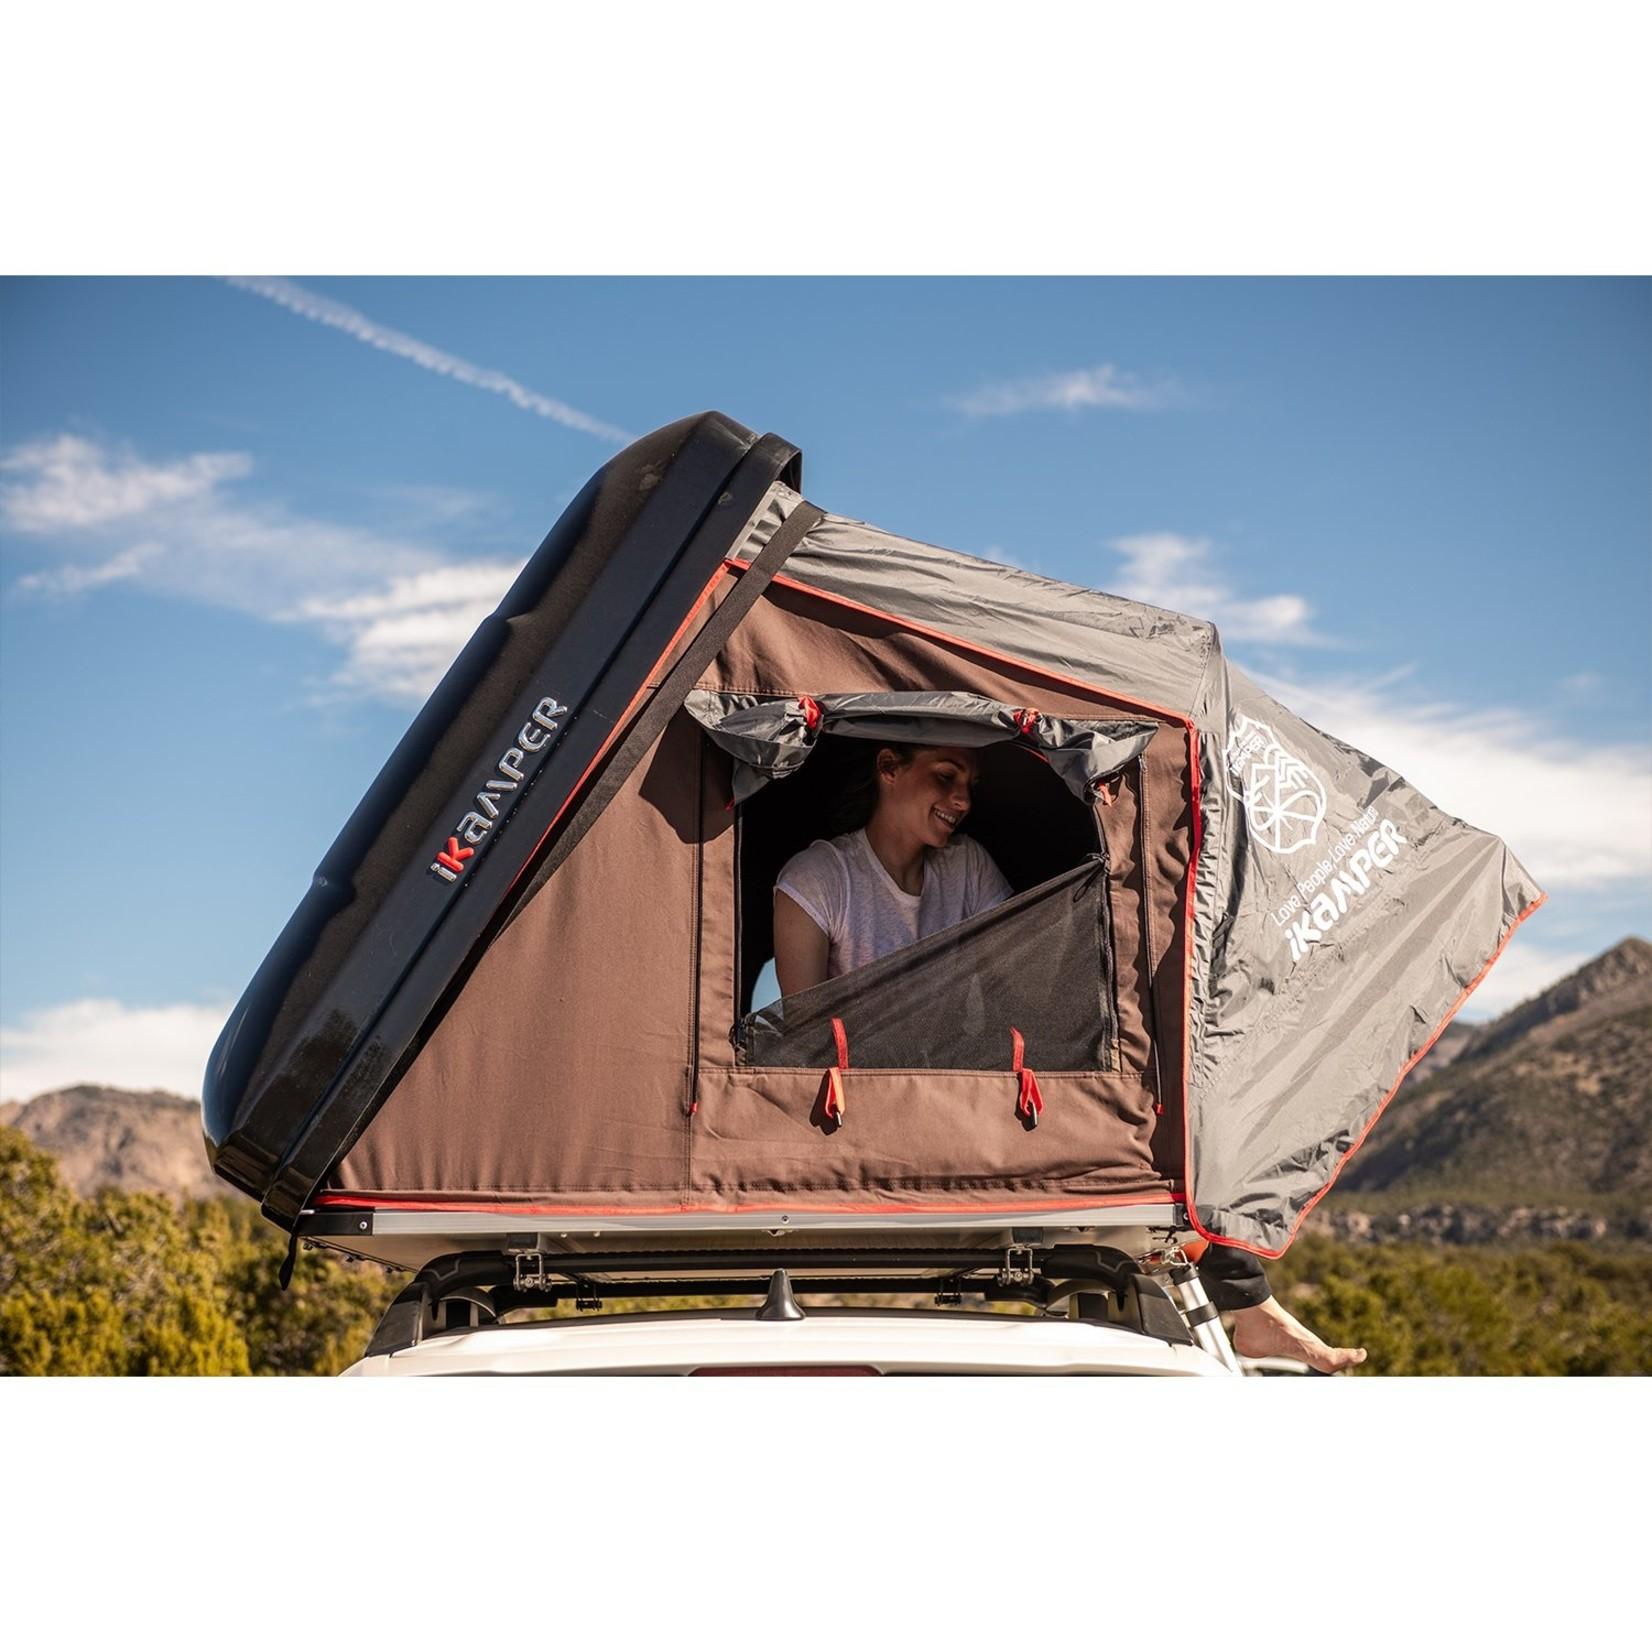 iKamper iKamper Skycamp 2X Rooftop Tent